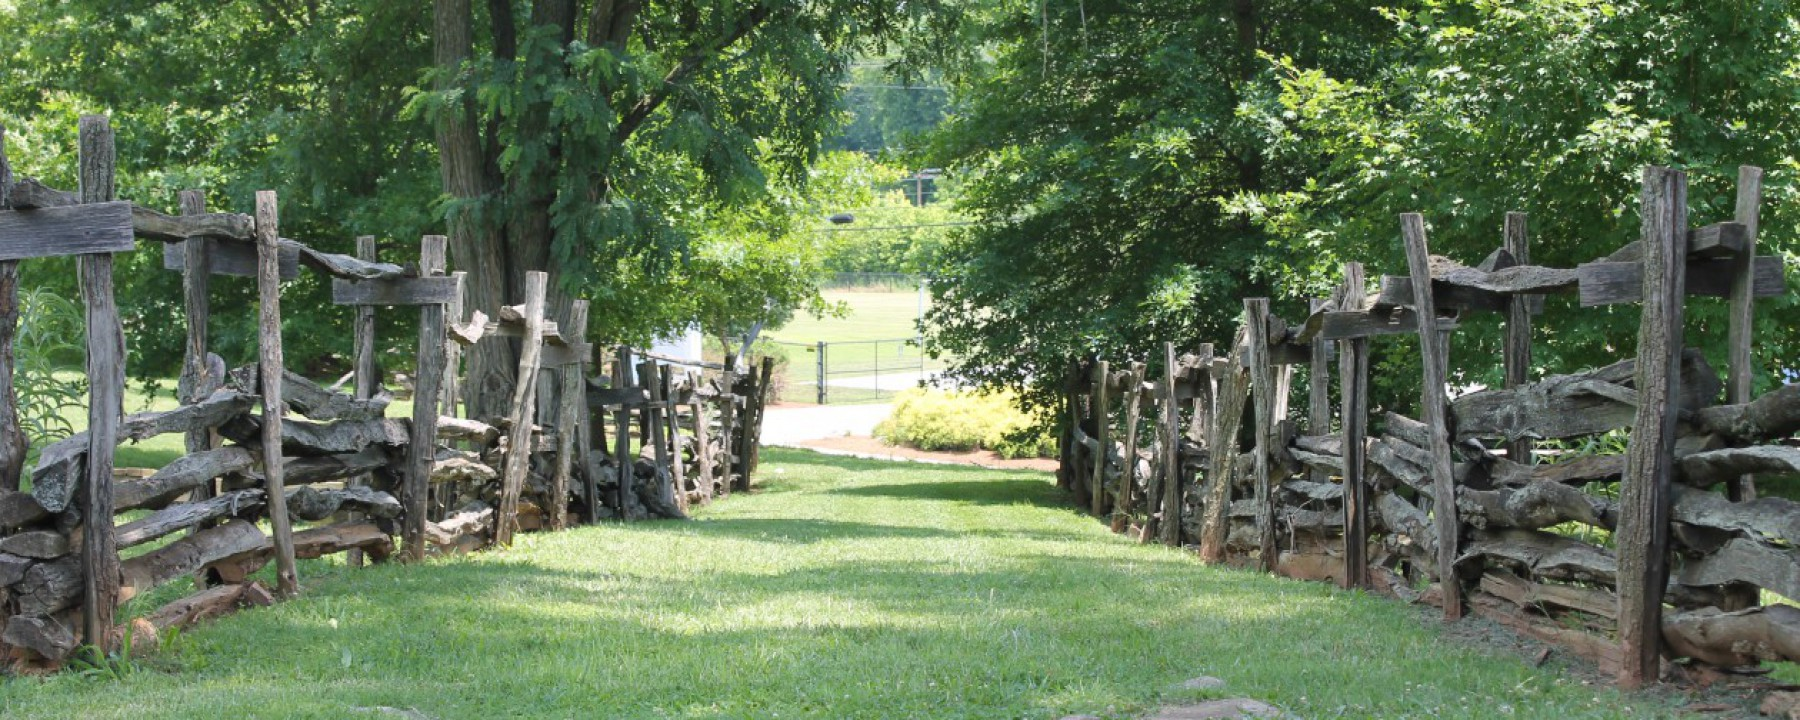 Grassy walkway in Old Salem, NC